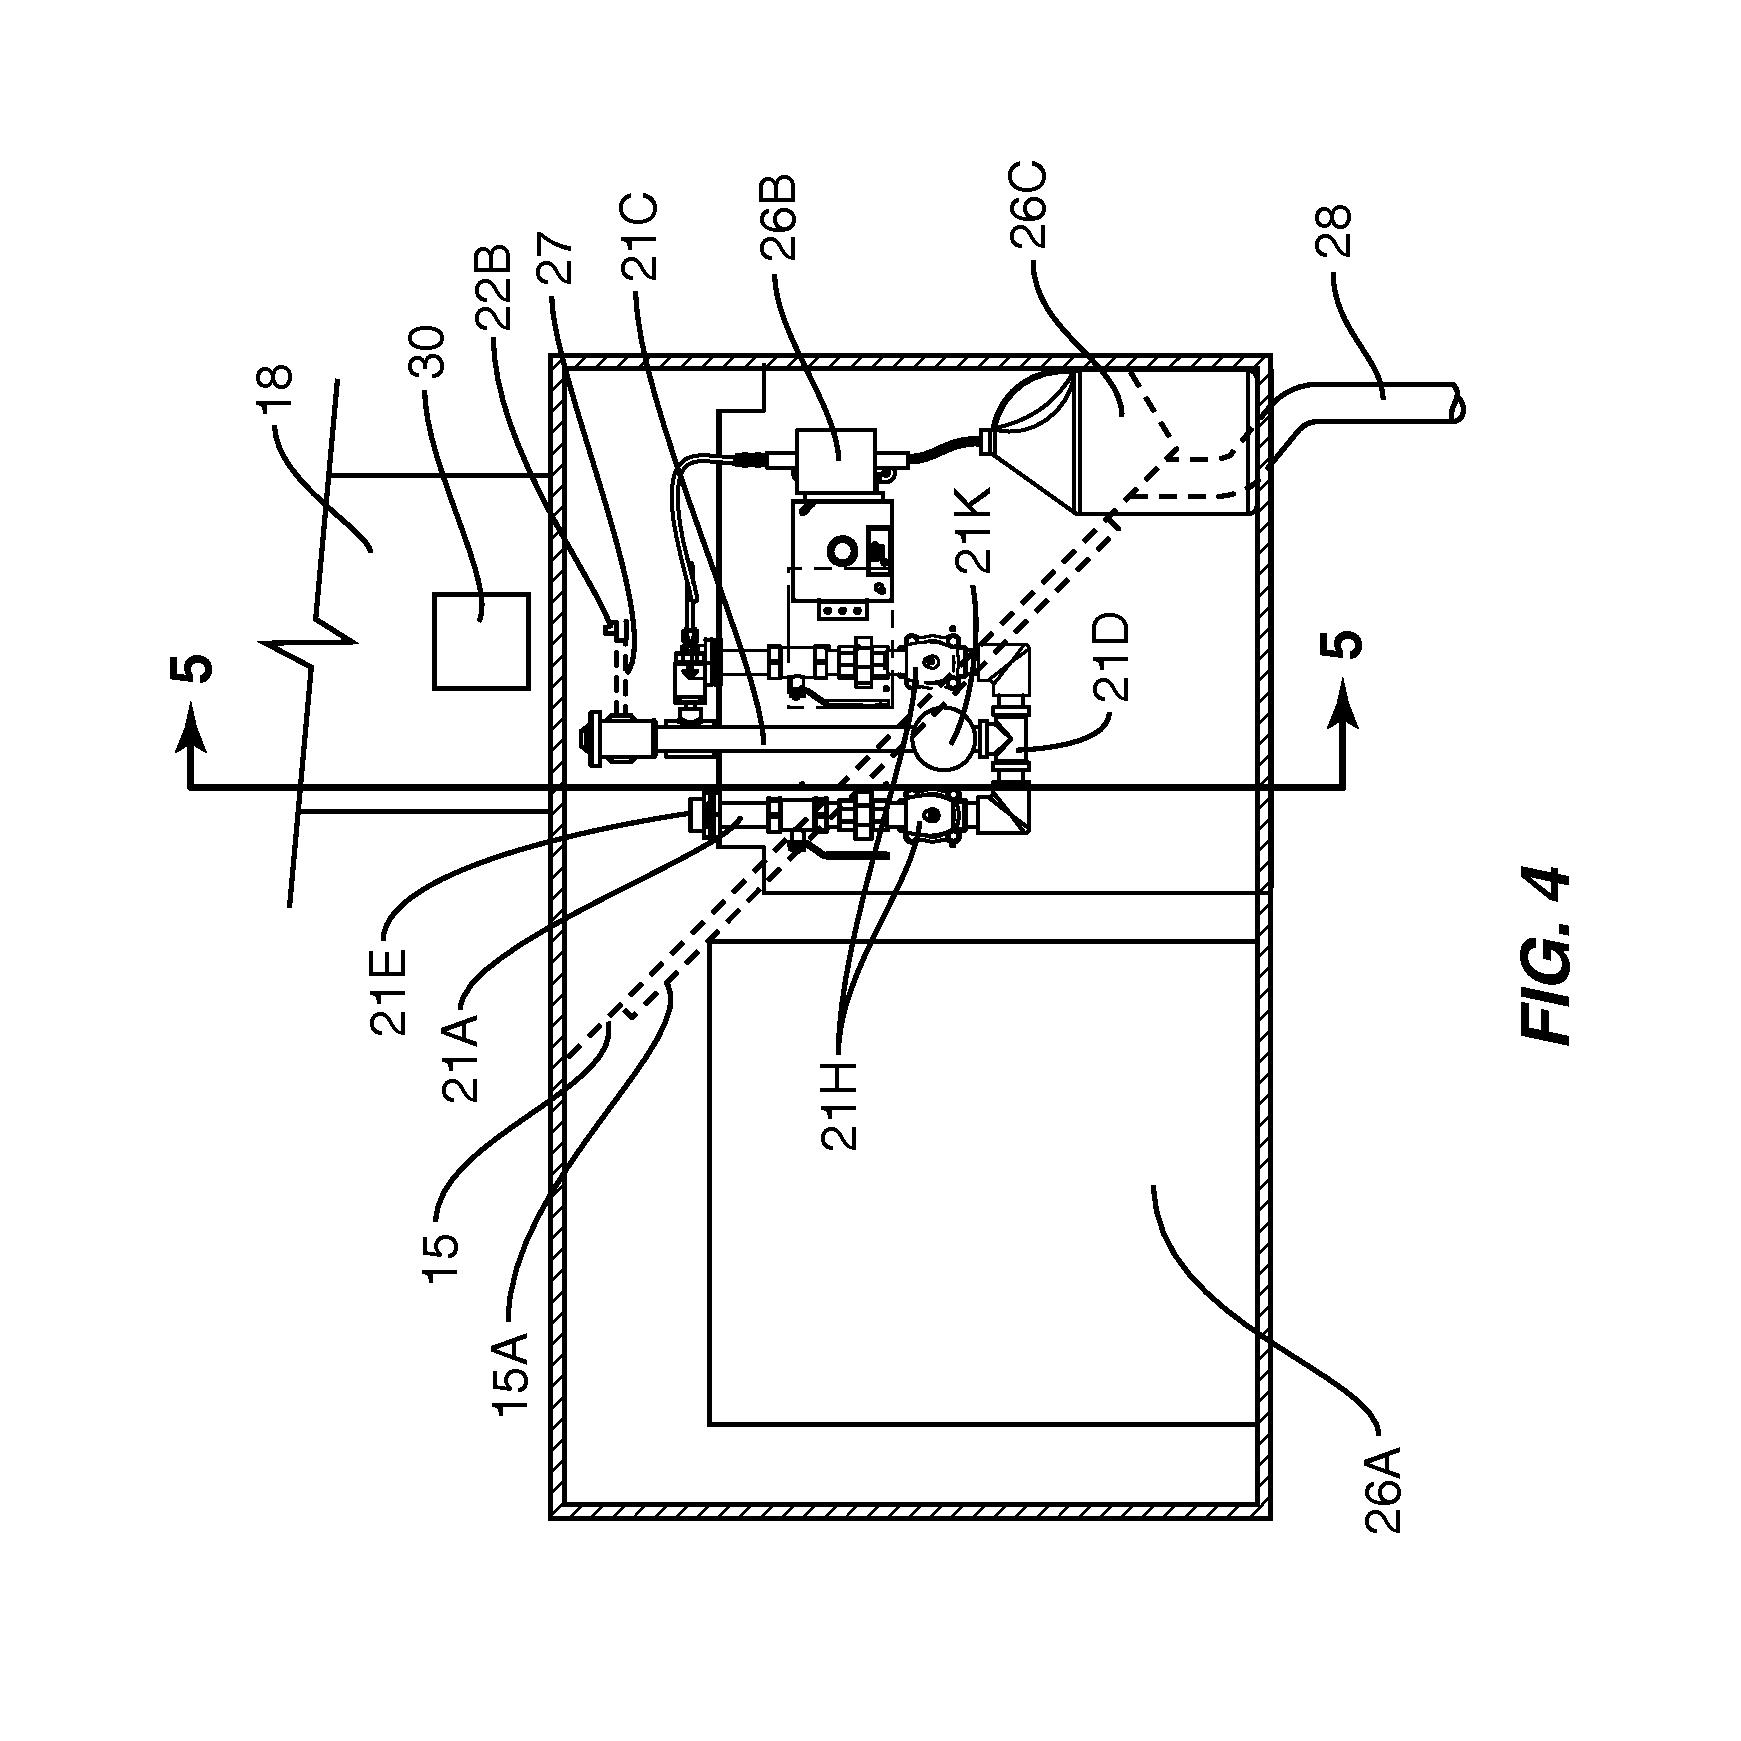 Shunt Trip Module Wiring Diagram